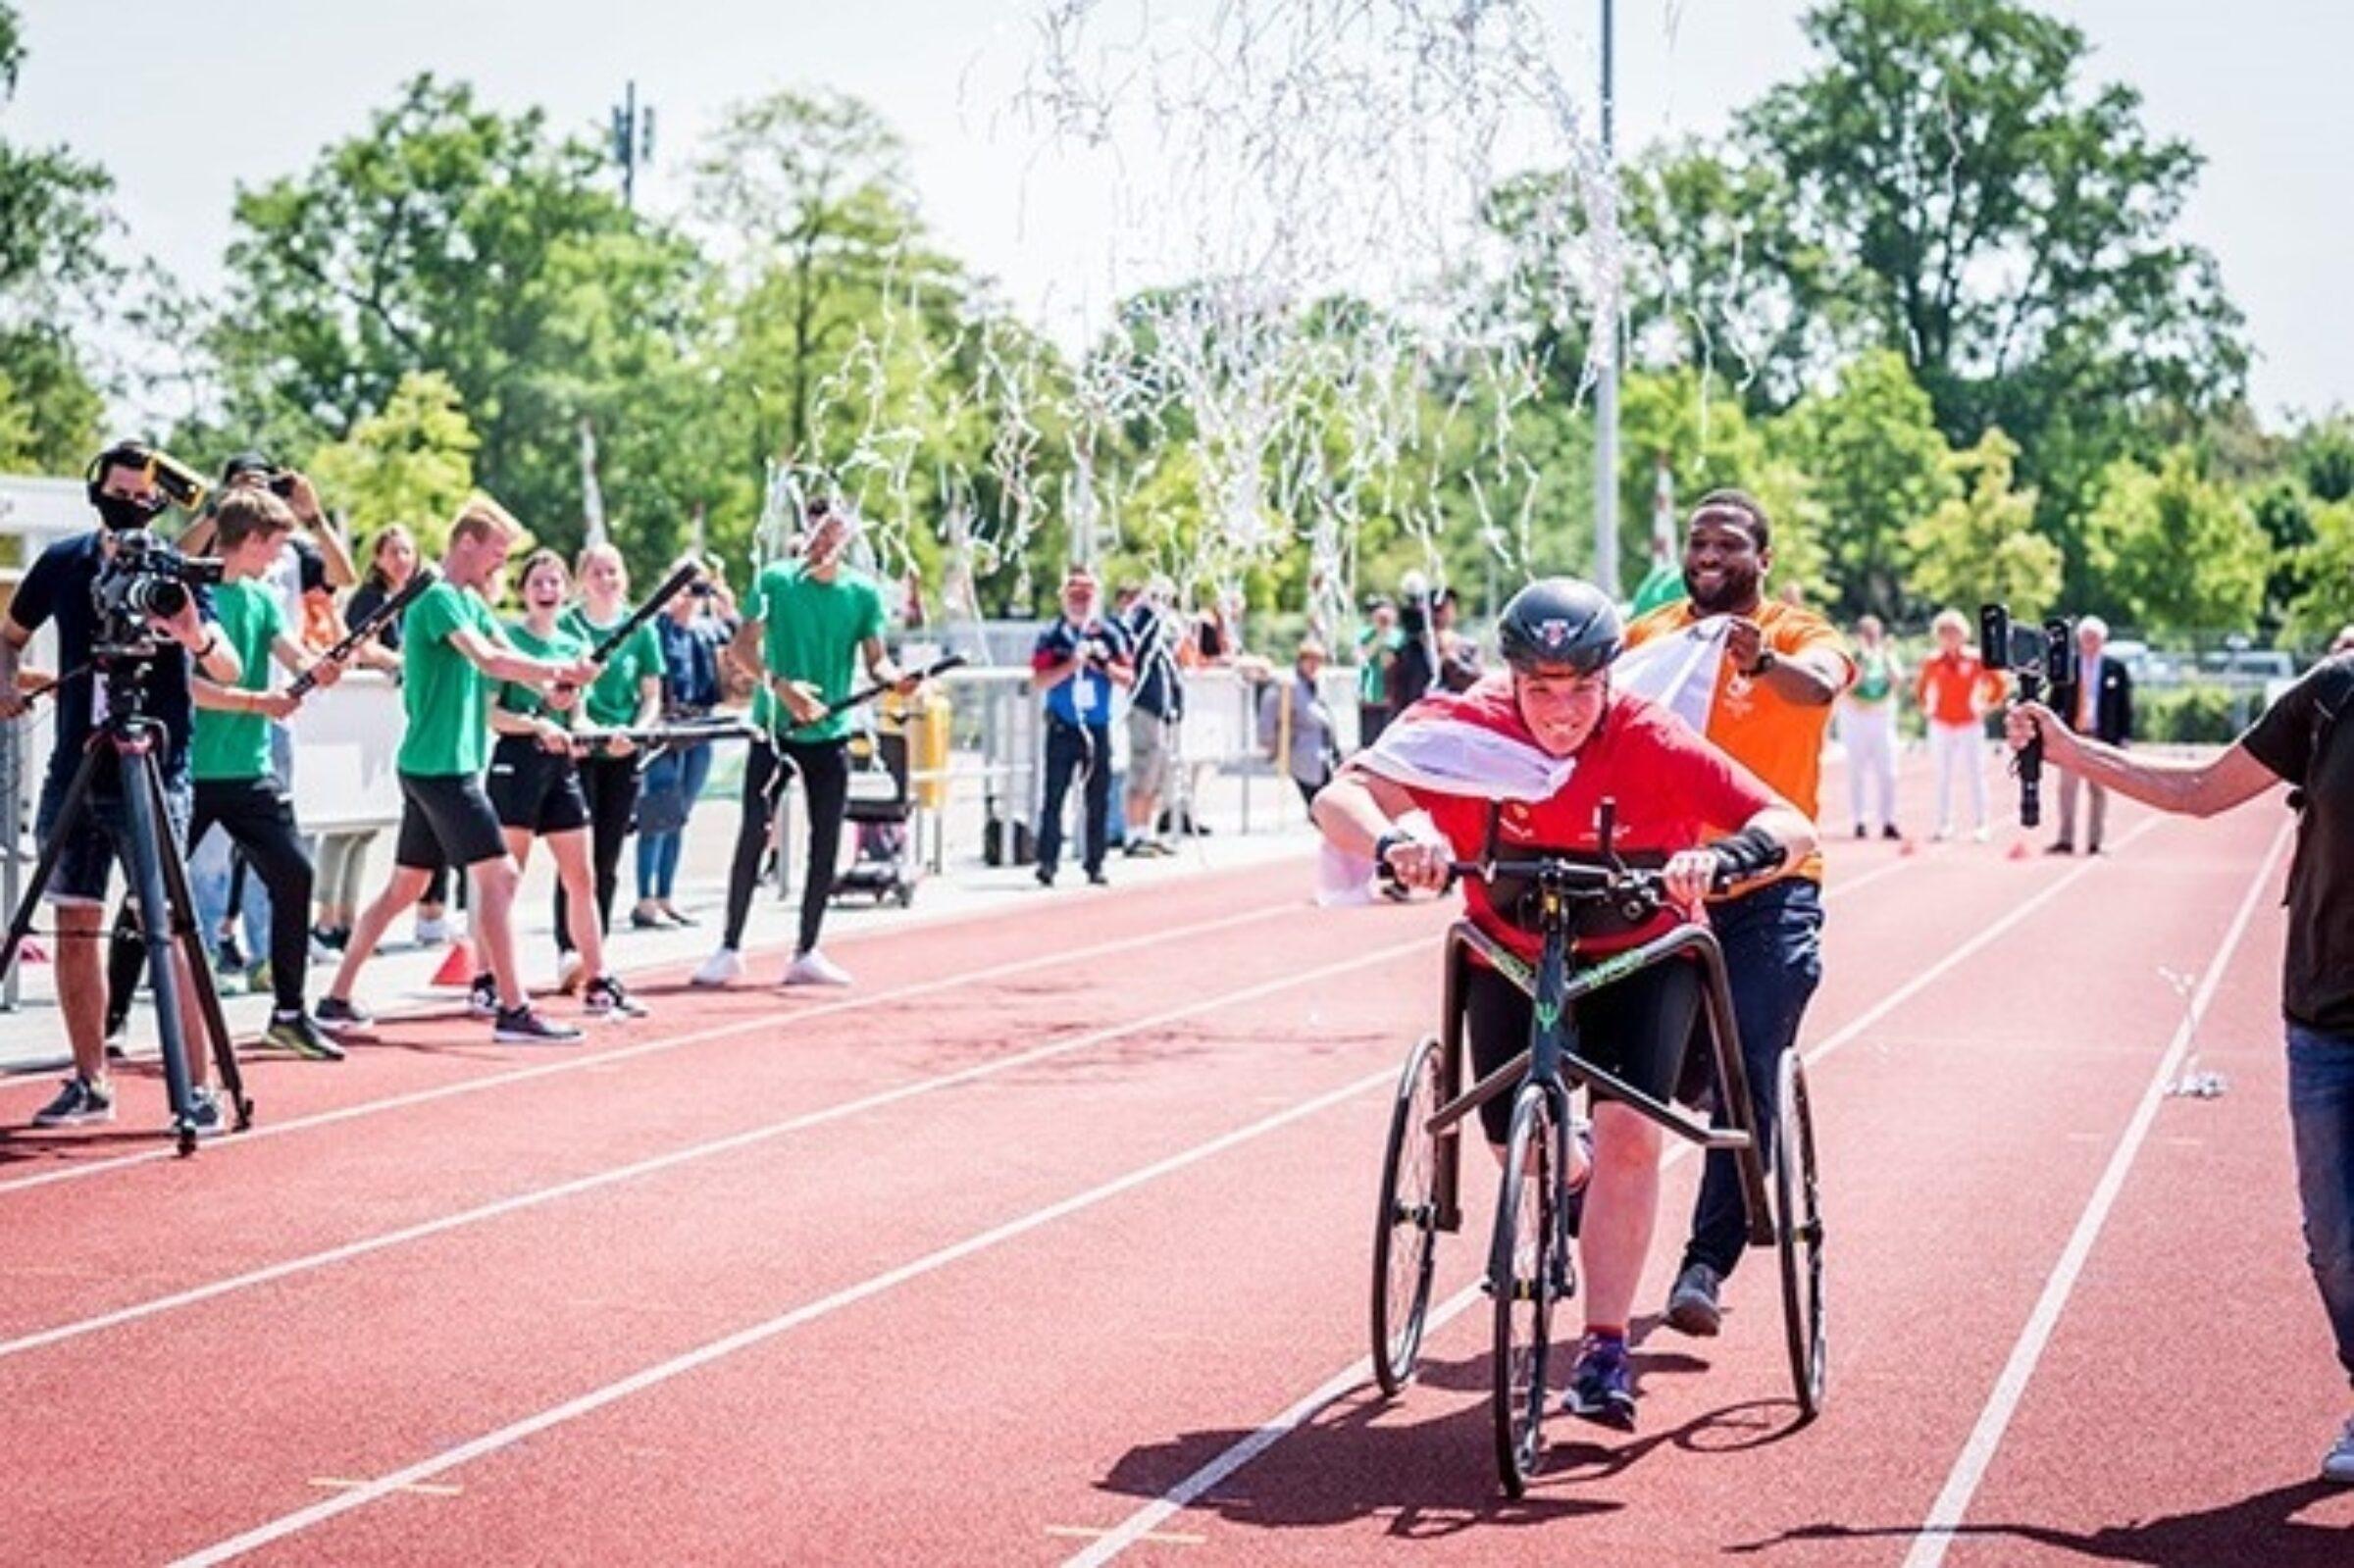 Sporter Maartje Ellenkamp